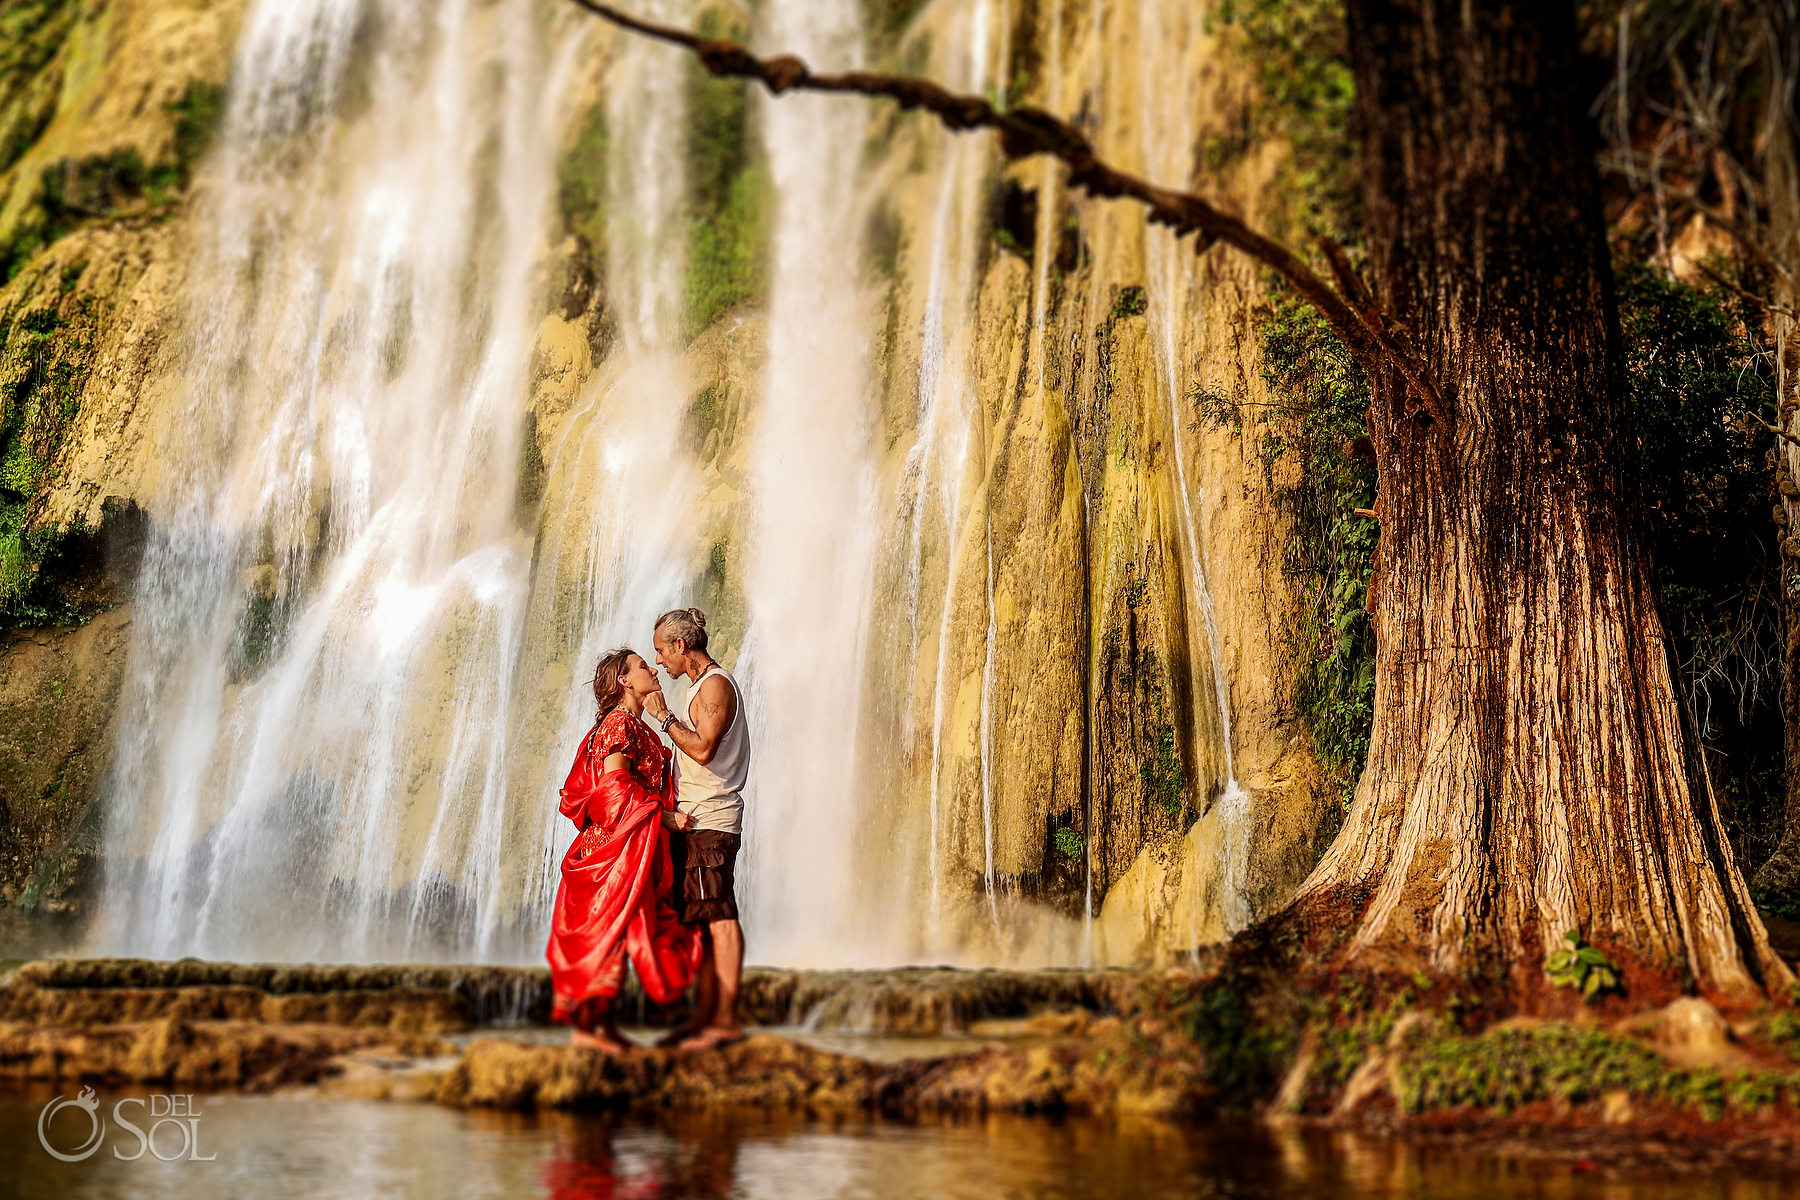 Waterfall Vow Renewal Experience Chiapas Mexico #travelforlove